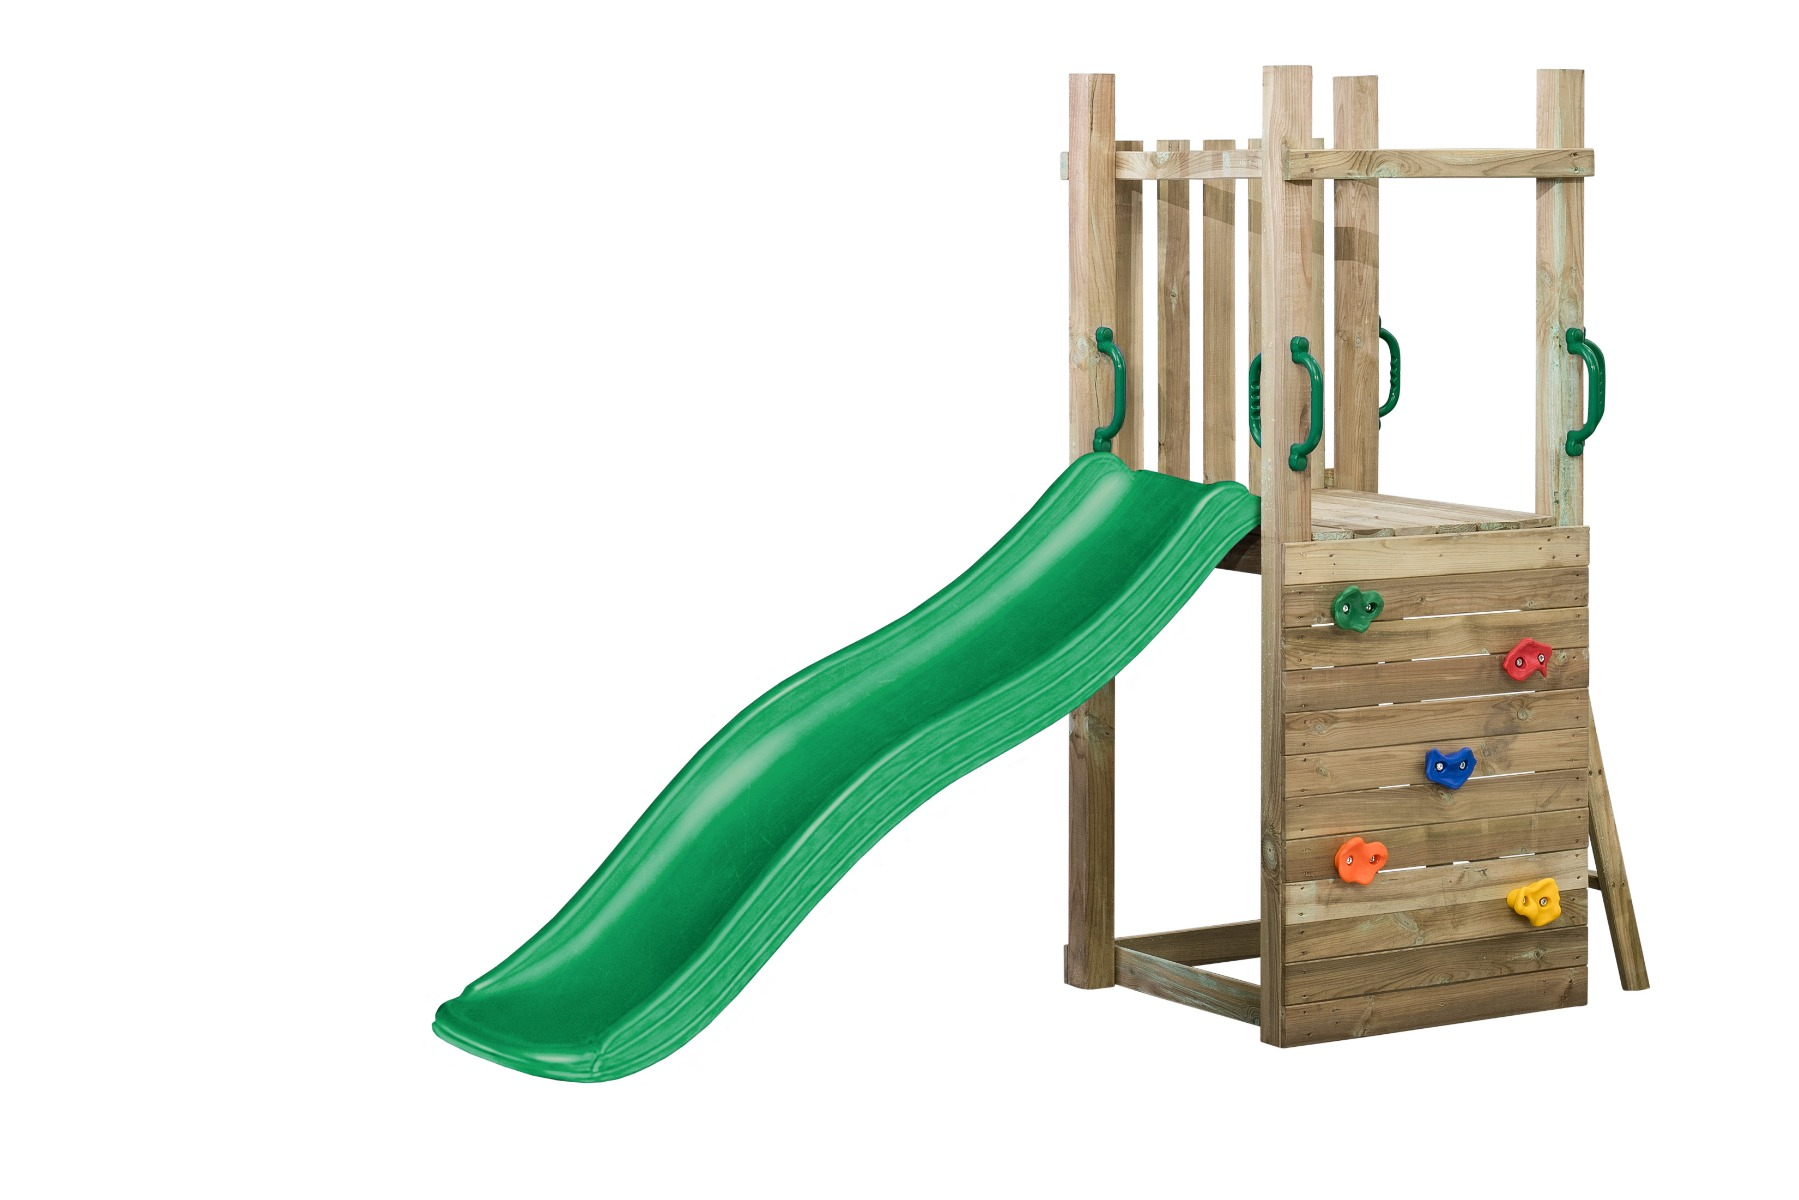 Holzschaukel Spielgerät Imca 70x160x175cm